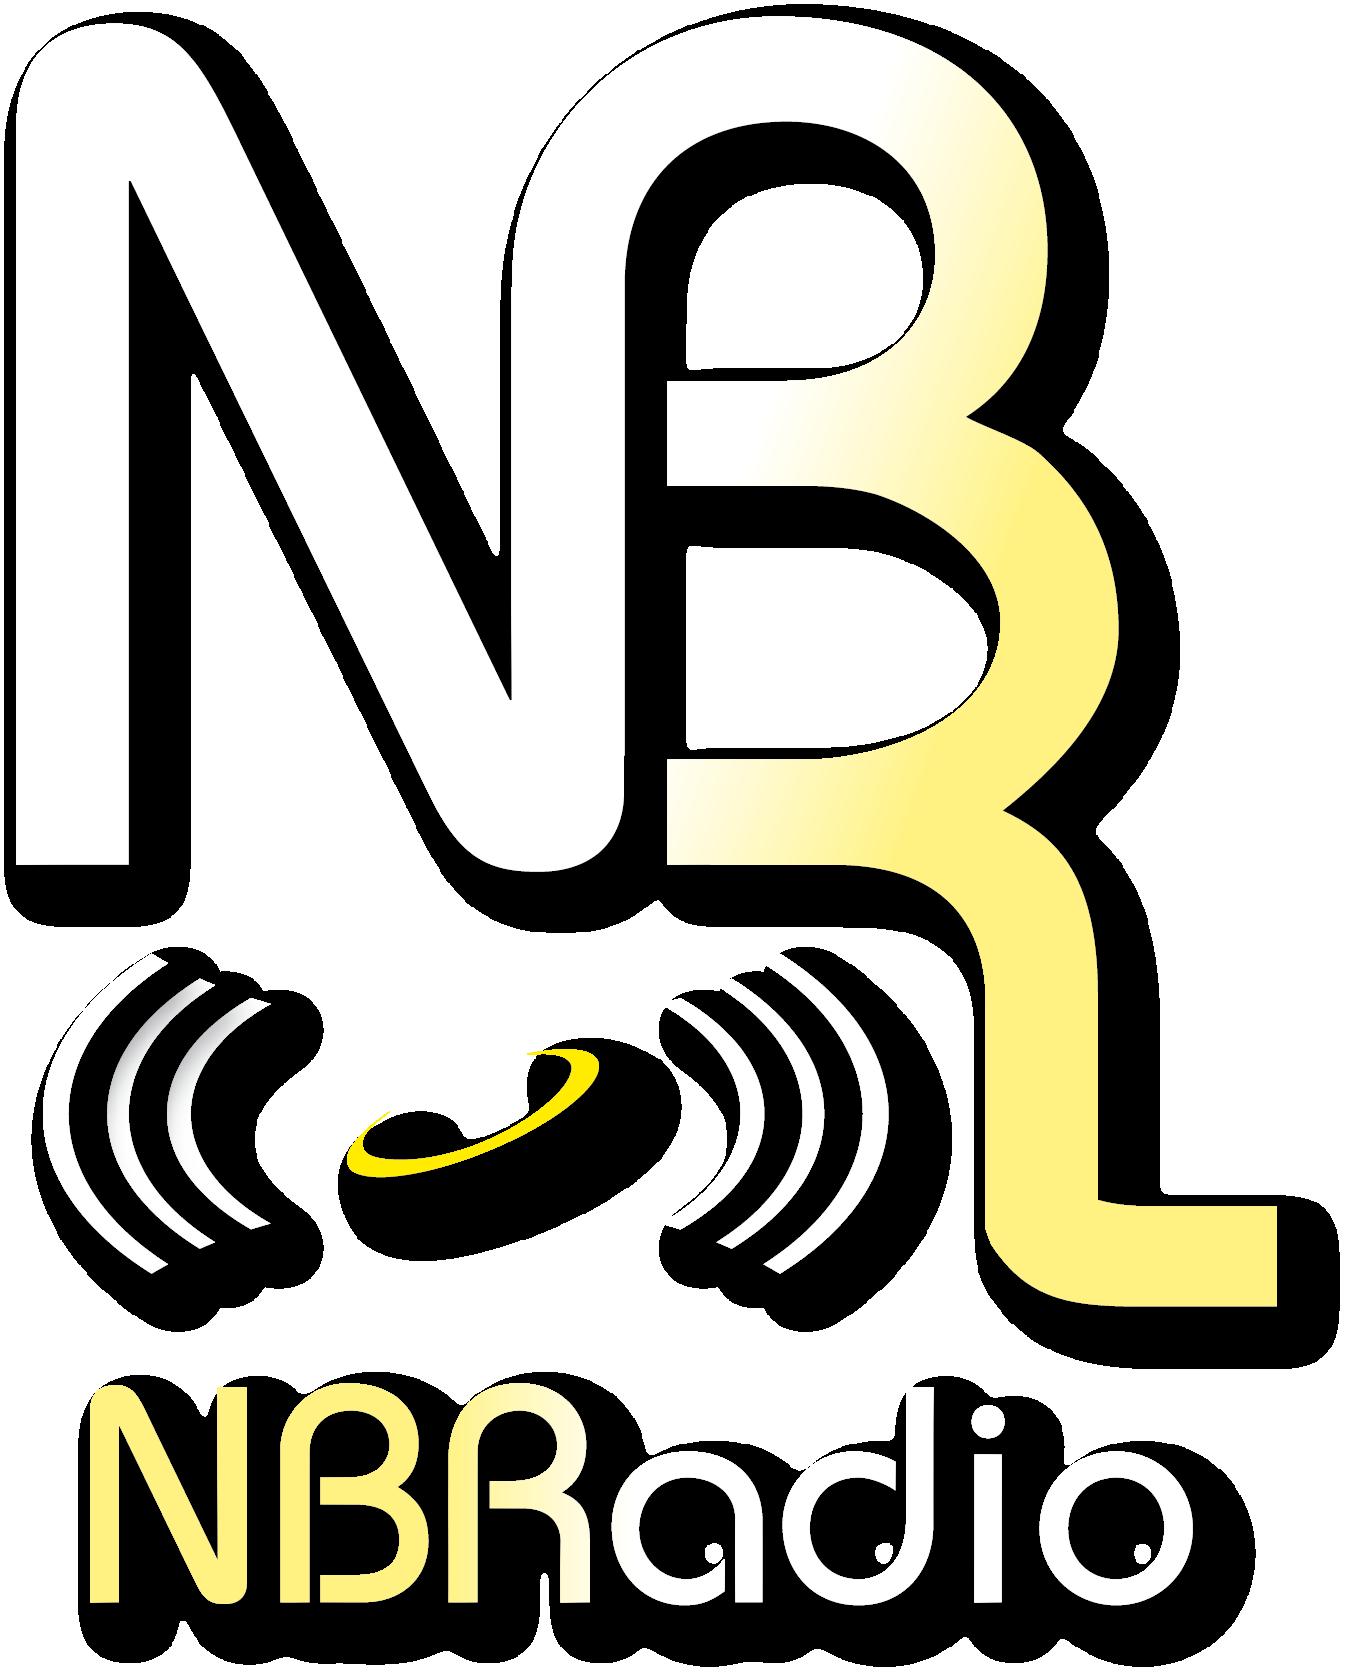 NBRadio